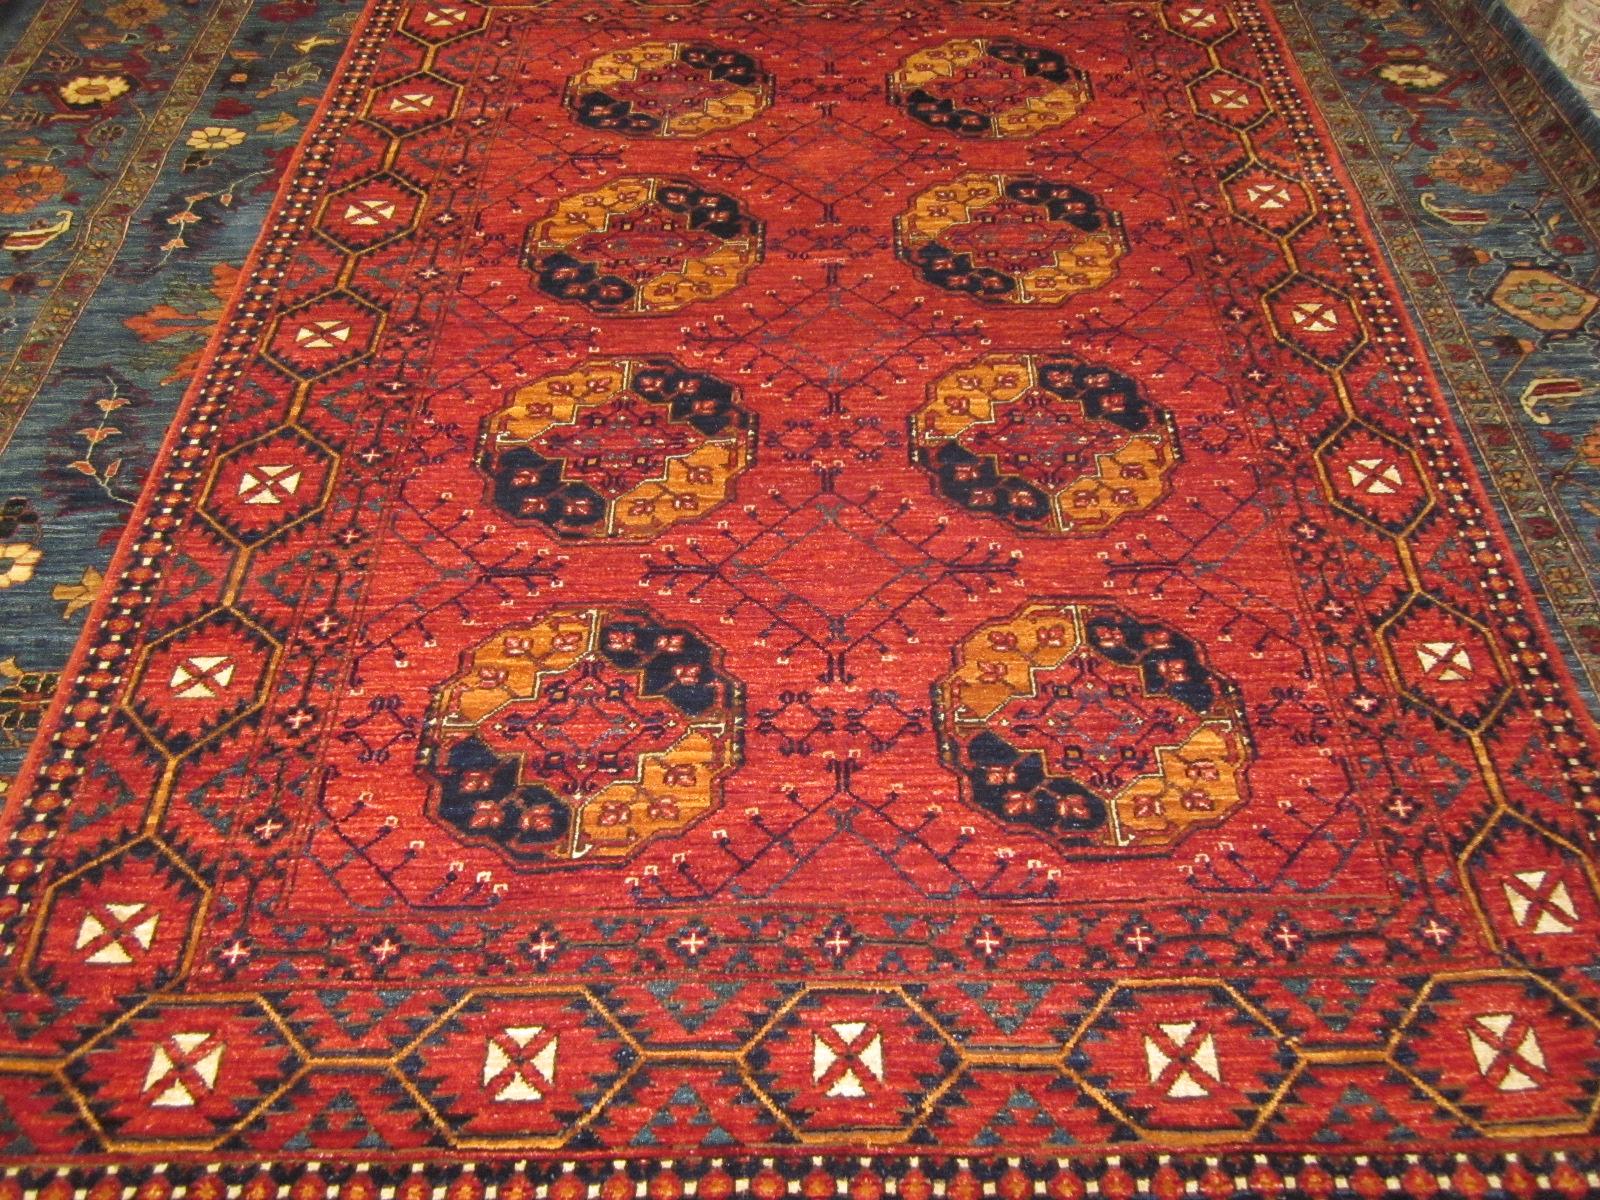 6x8-Ersari-Turkoman-rug-from-Afghanistan